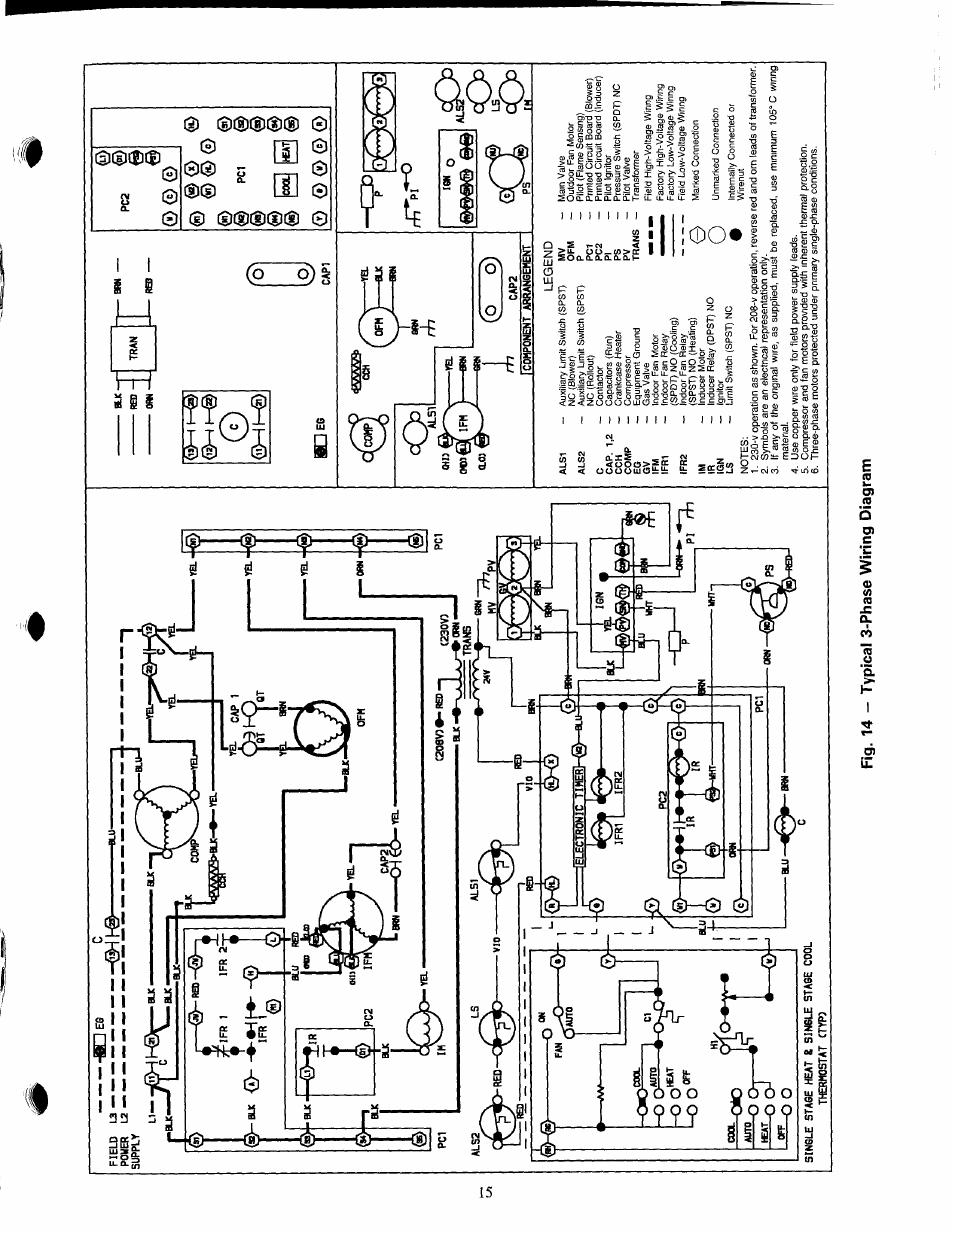 medium resolution of  rittenhouse door chime wiring diagram on rittenhouse intercom